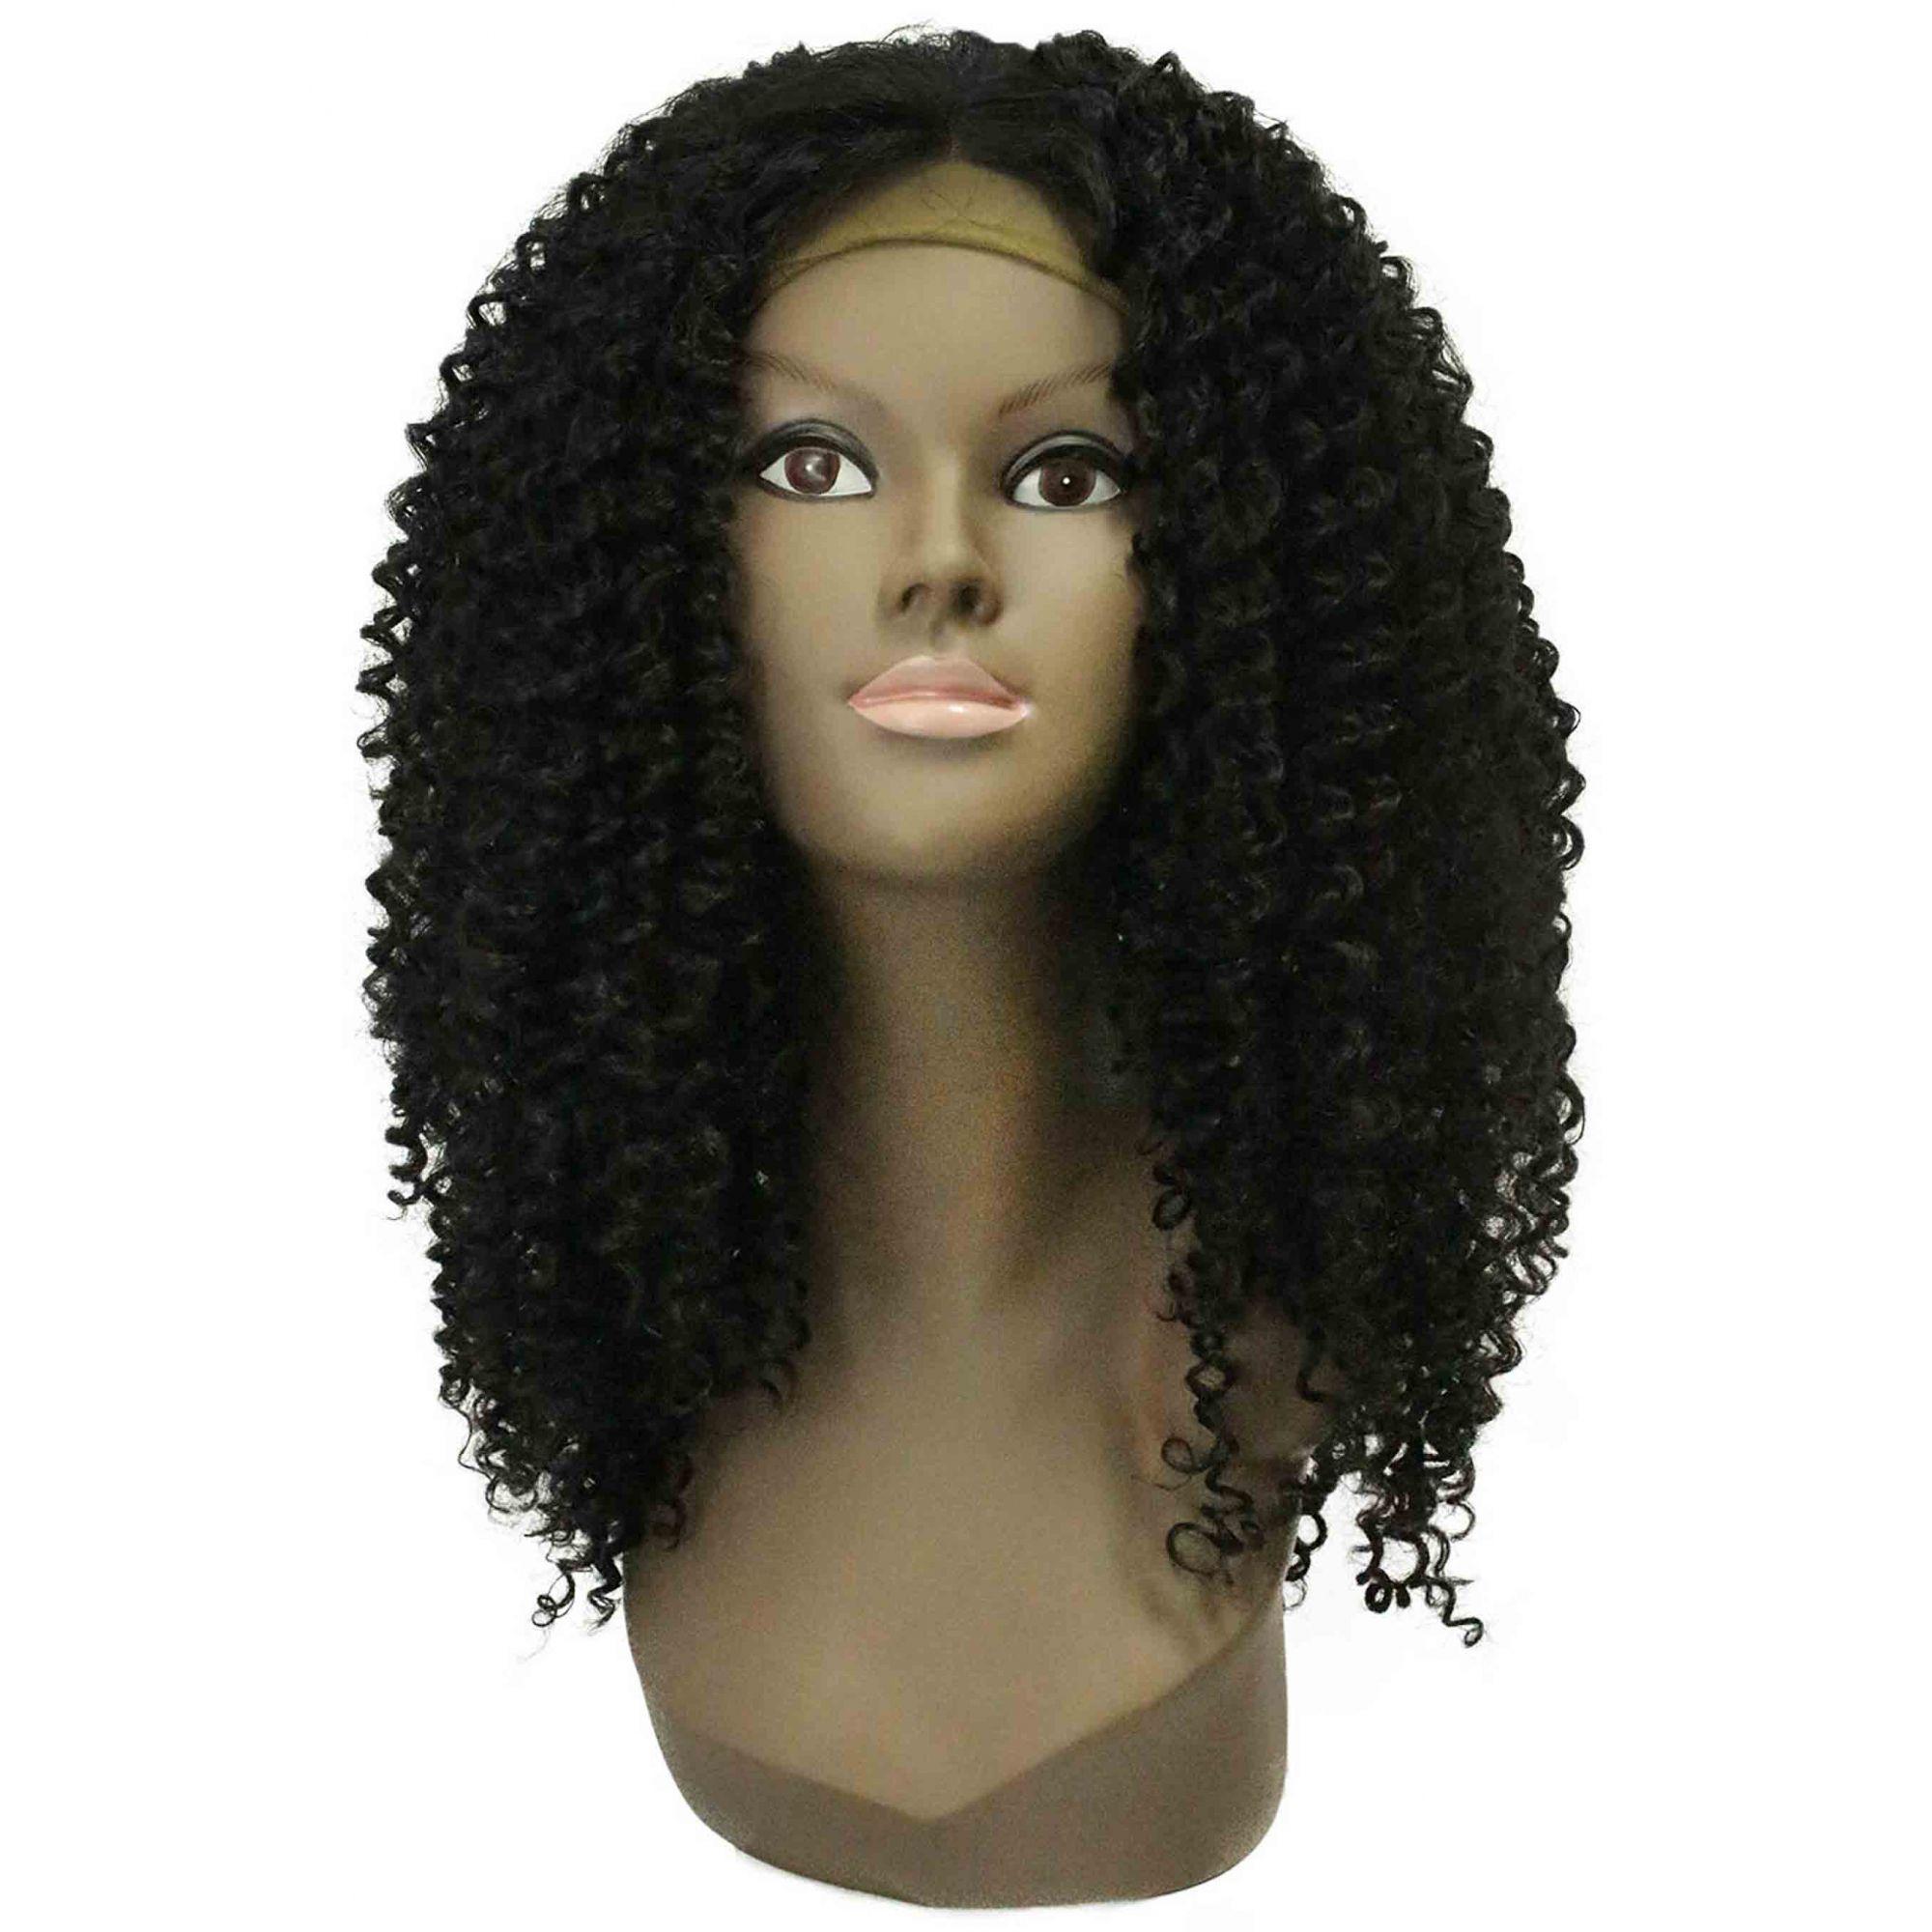 Peruca Orgânica - Front Lace Wig Fashion Line - Milanda